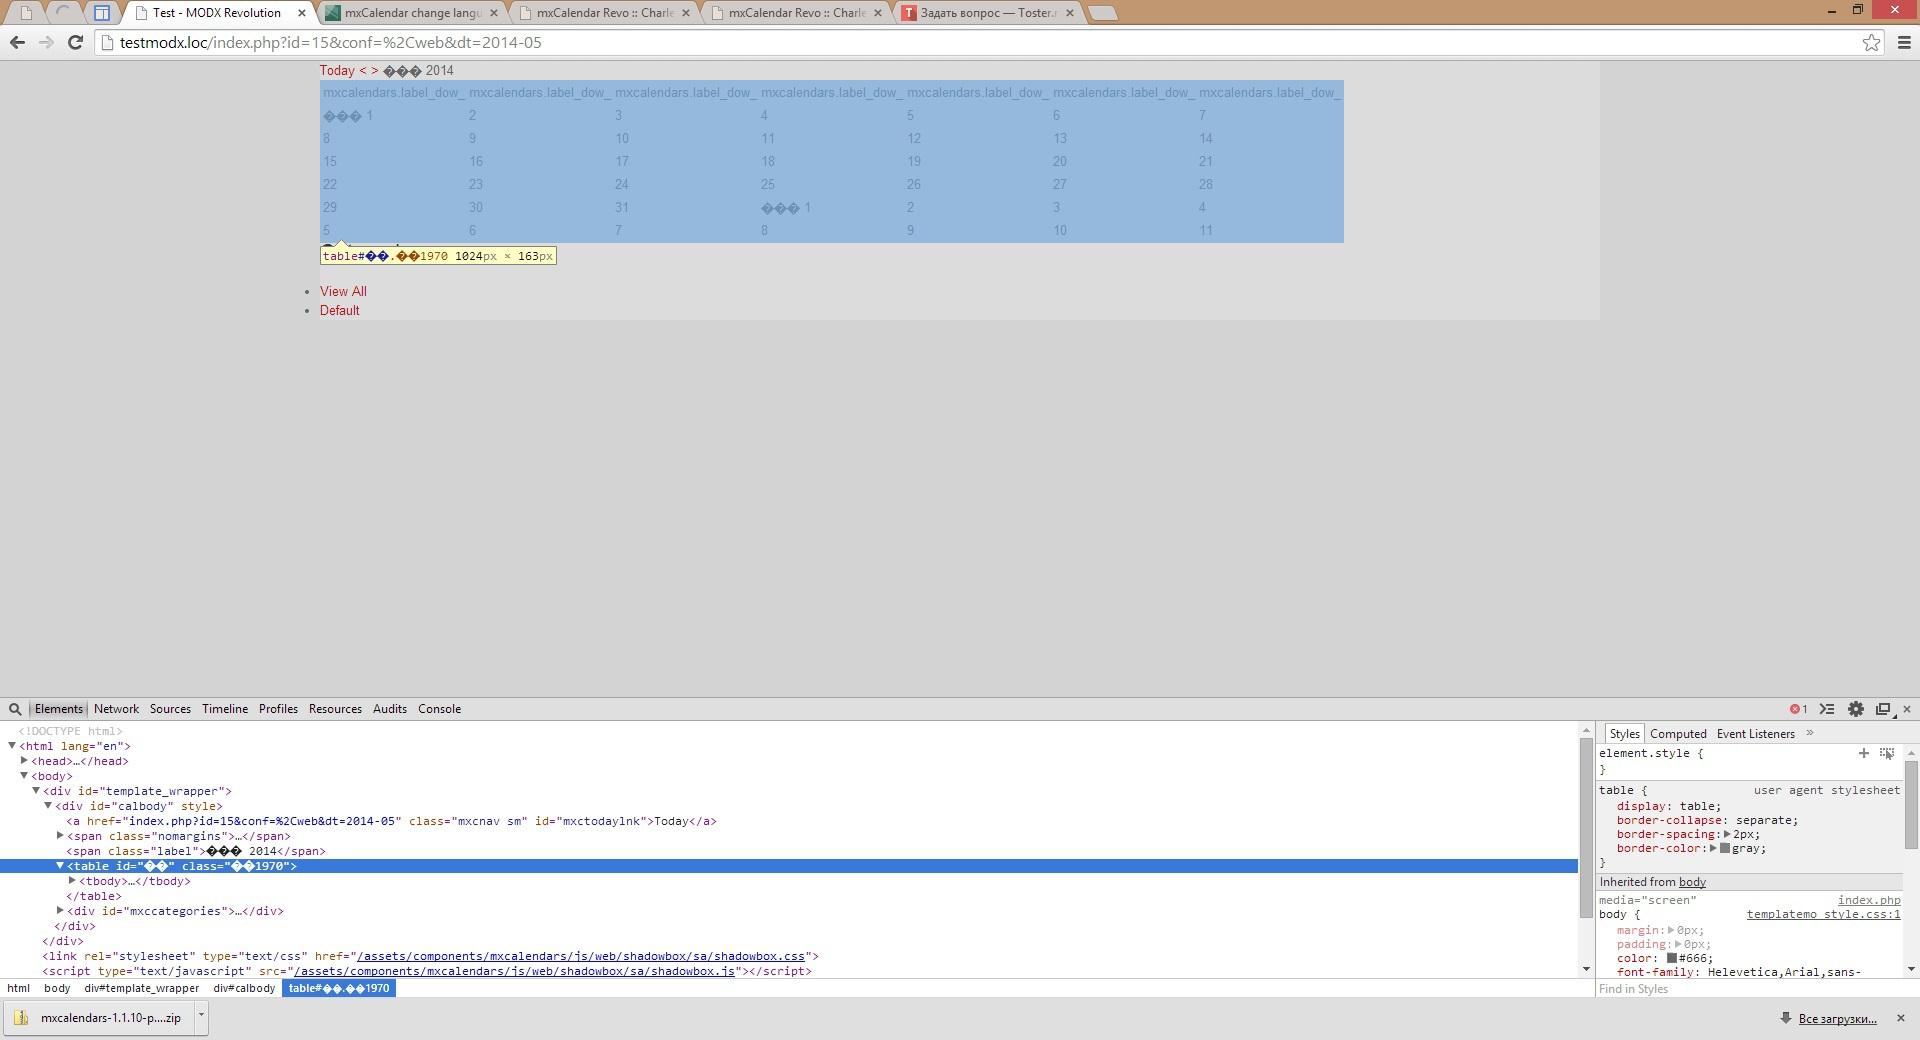 mxCalendar not working. | MODX Community Forums